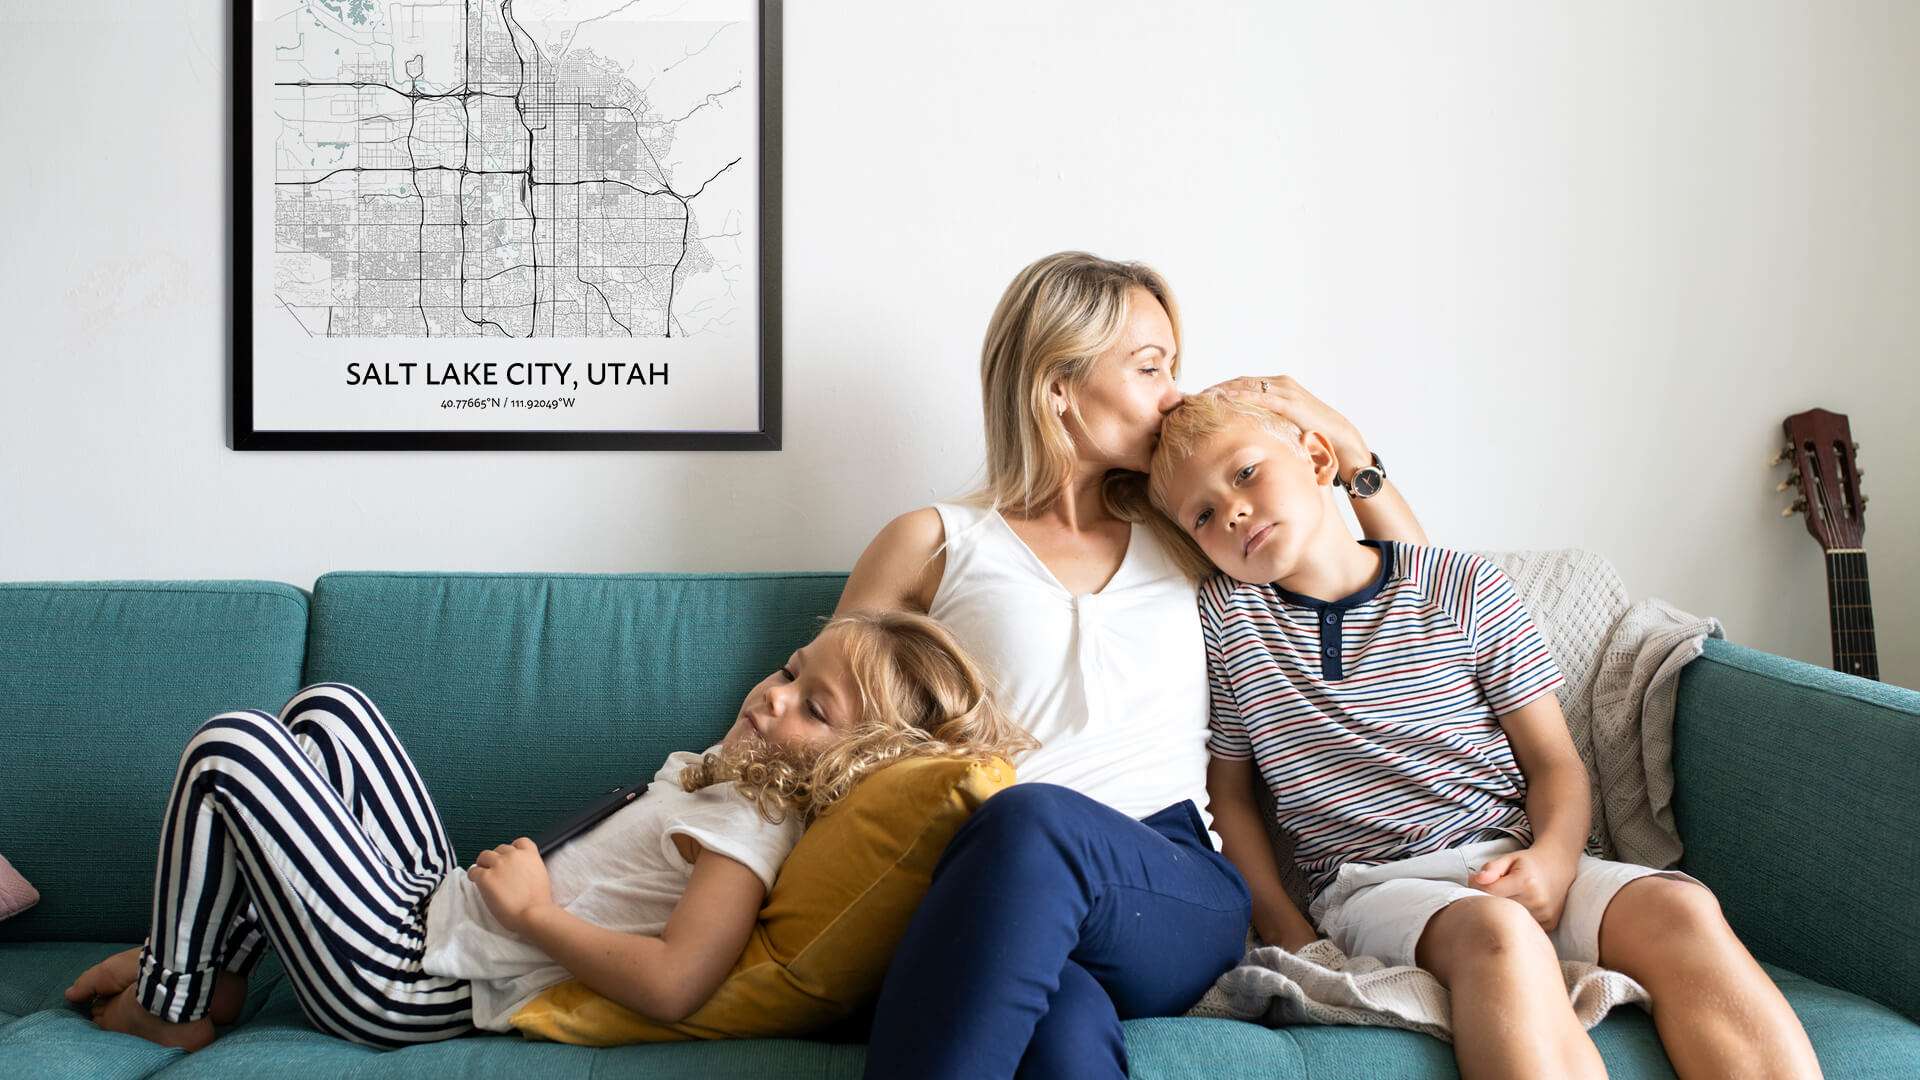 Salt Lake City map poster